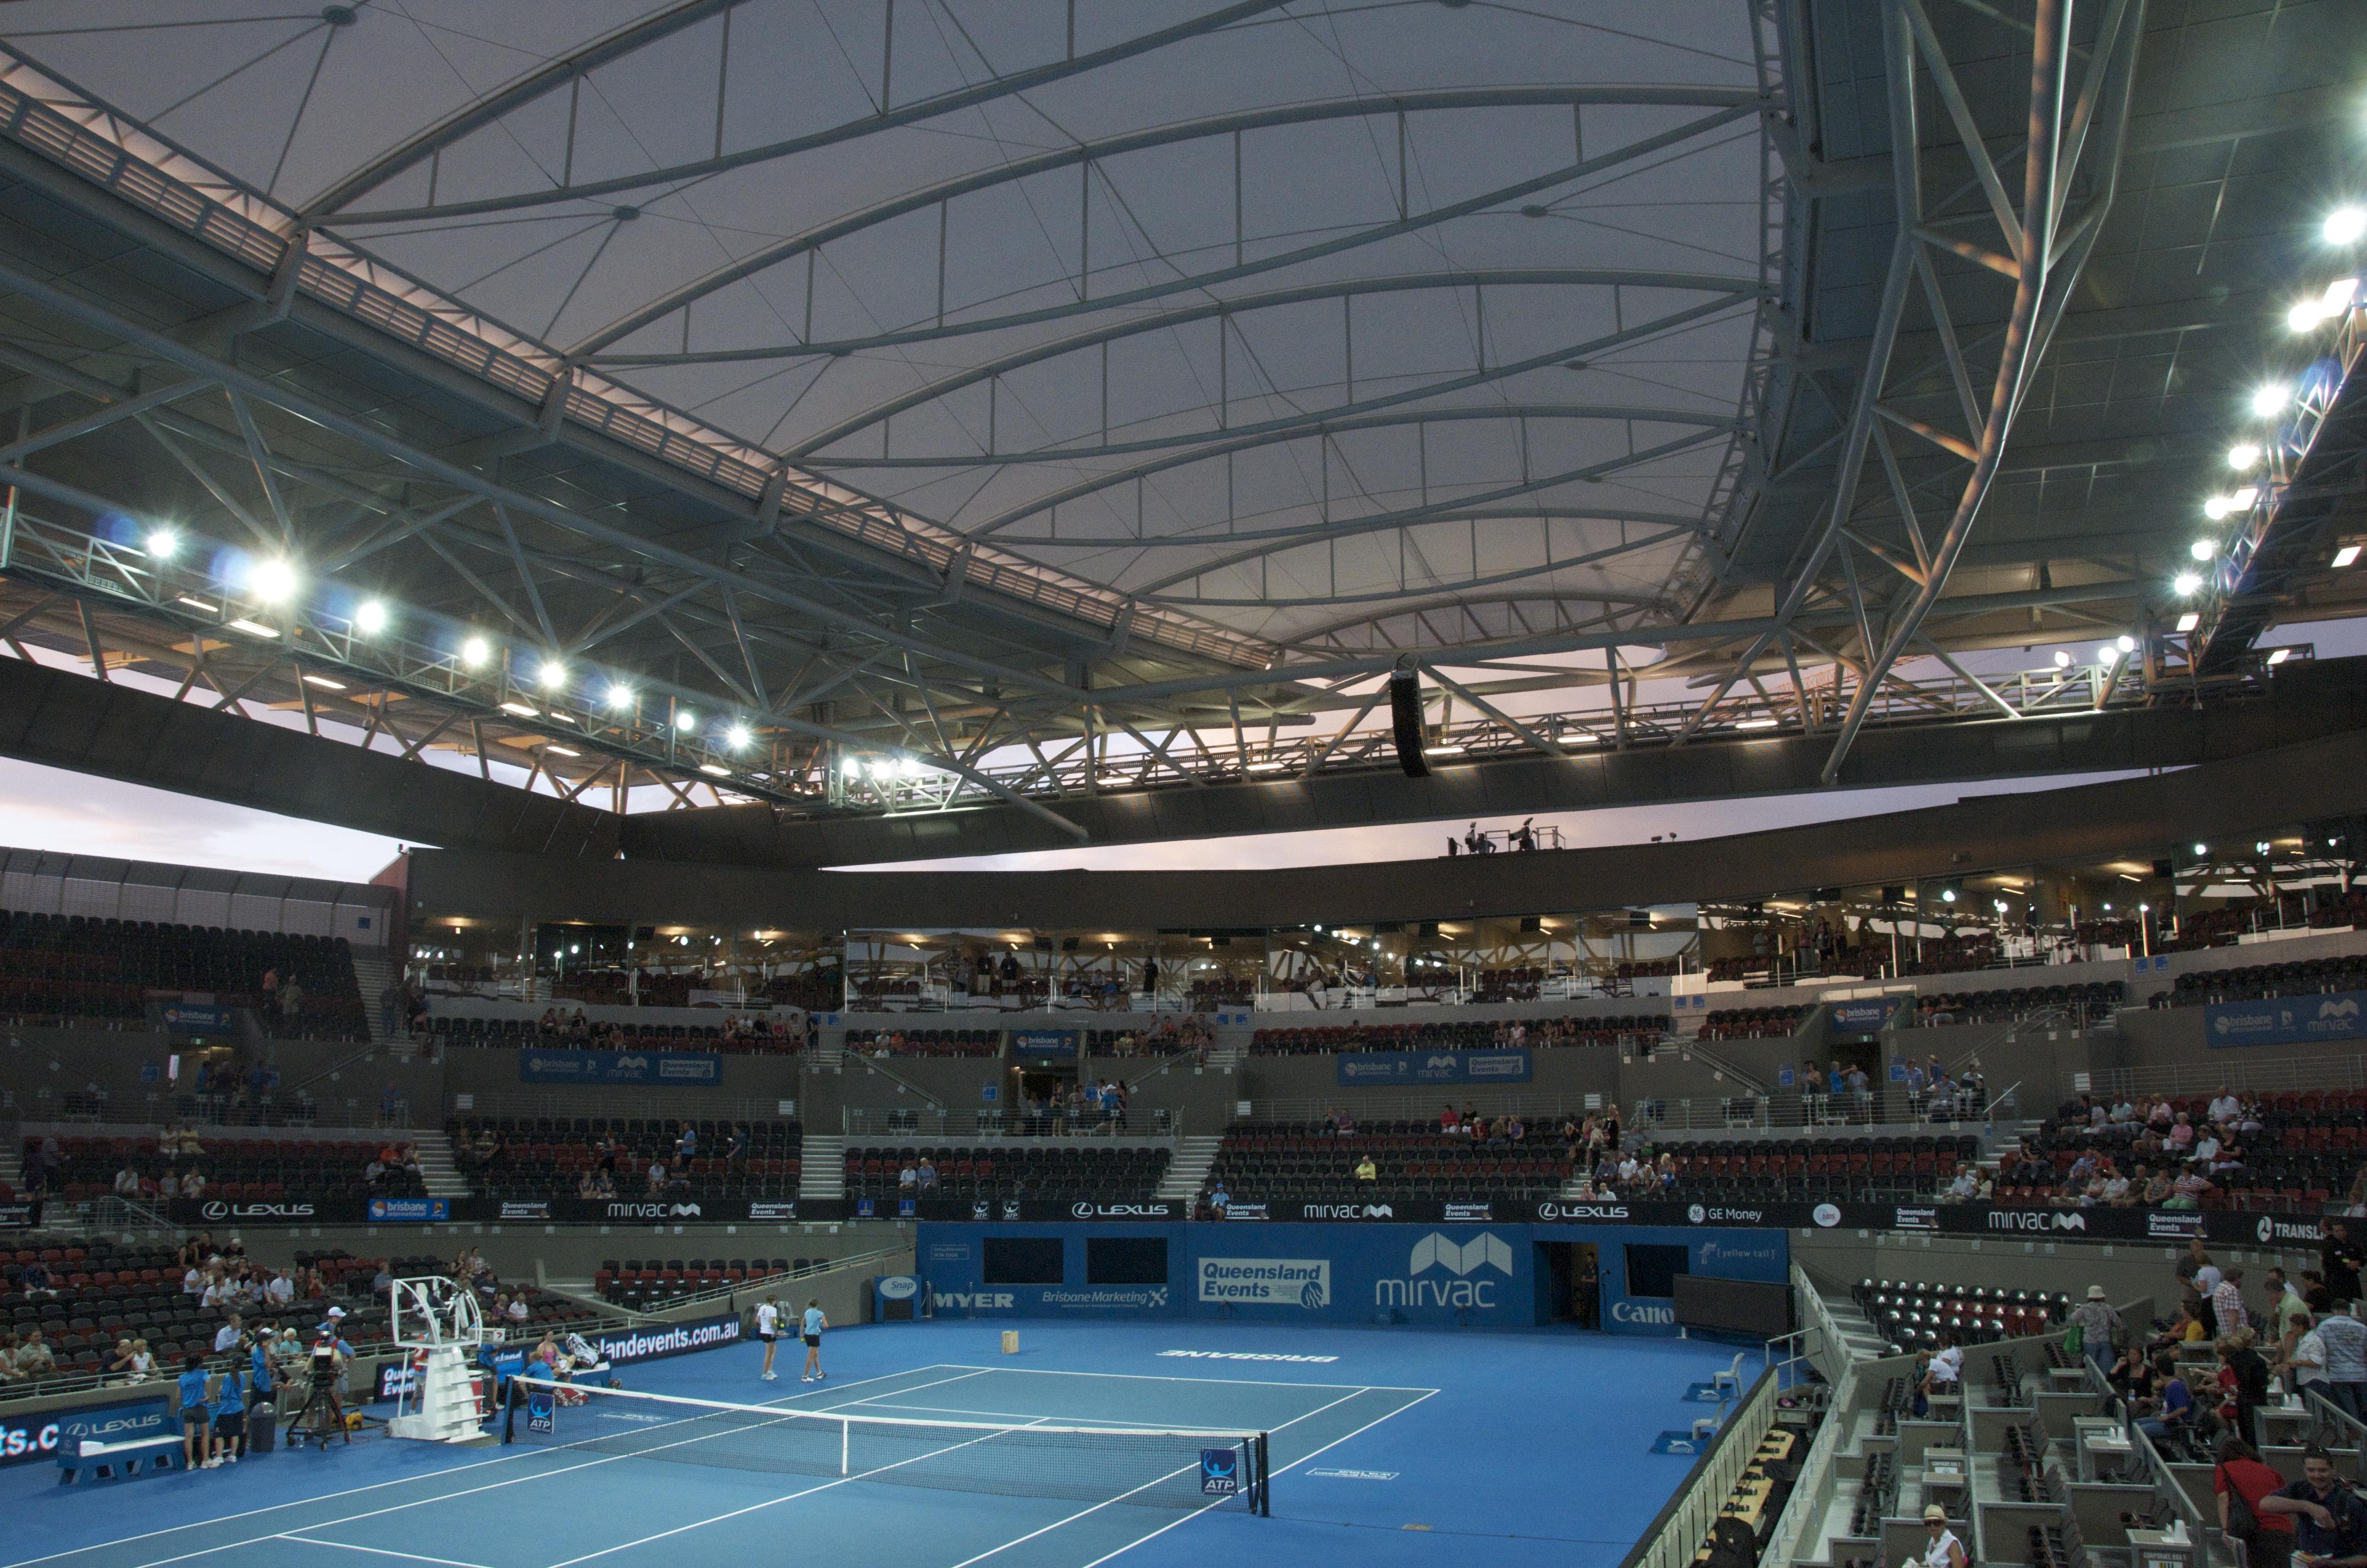 Queensland Tennis Centre - Wikipedia